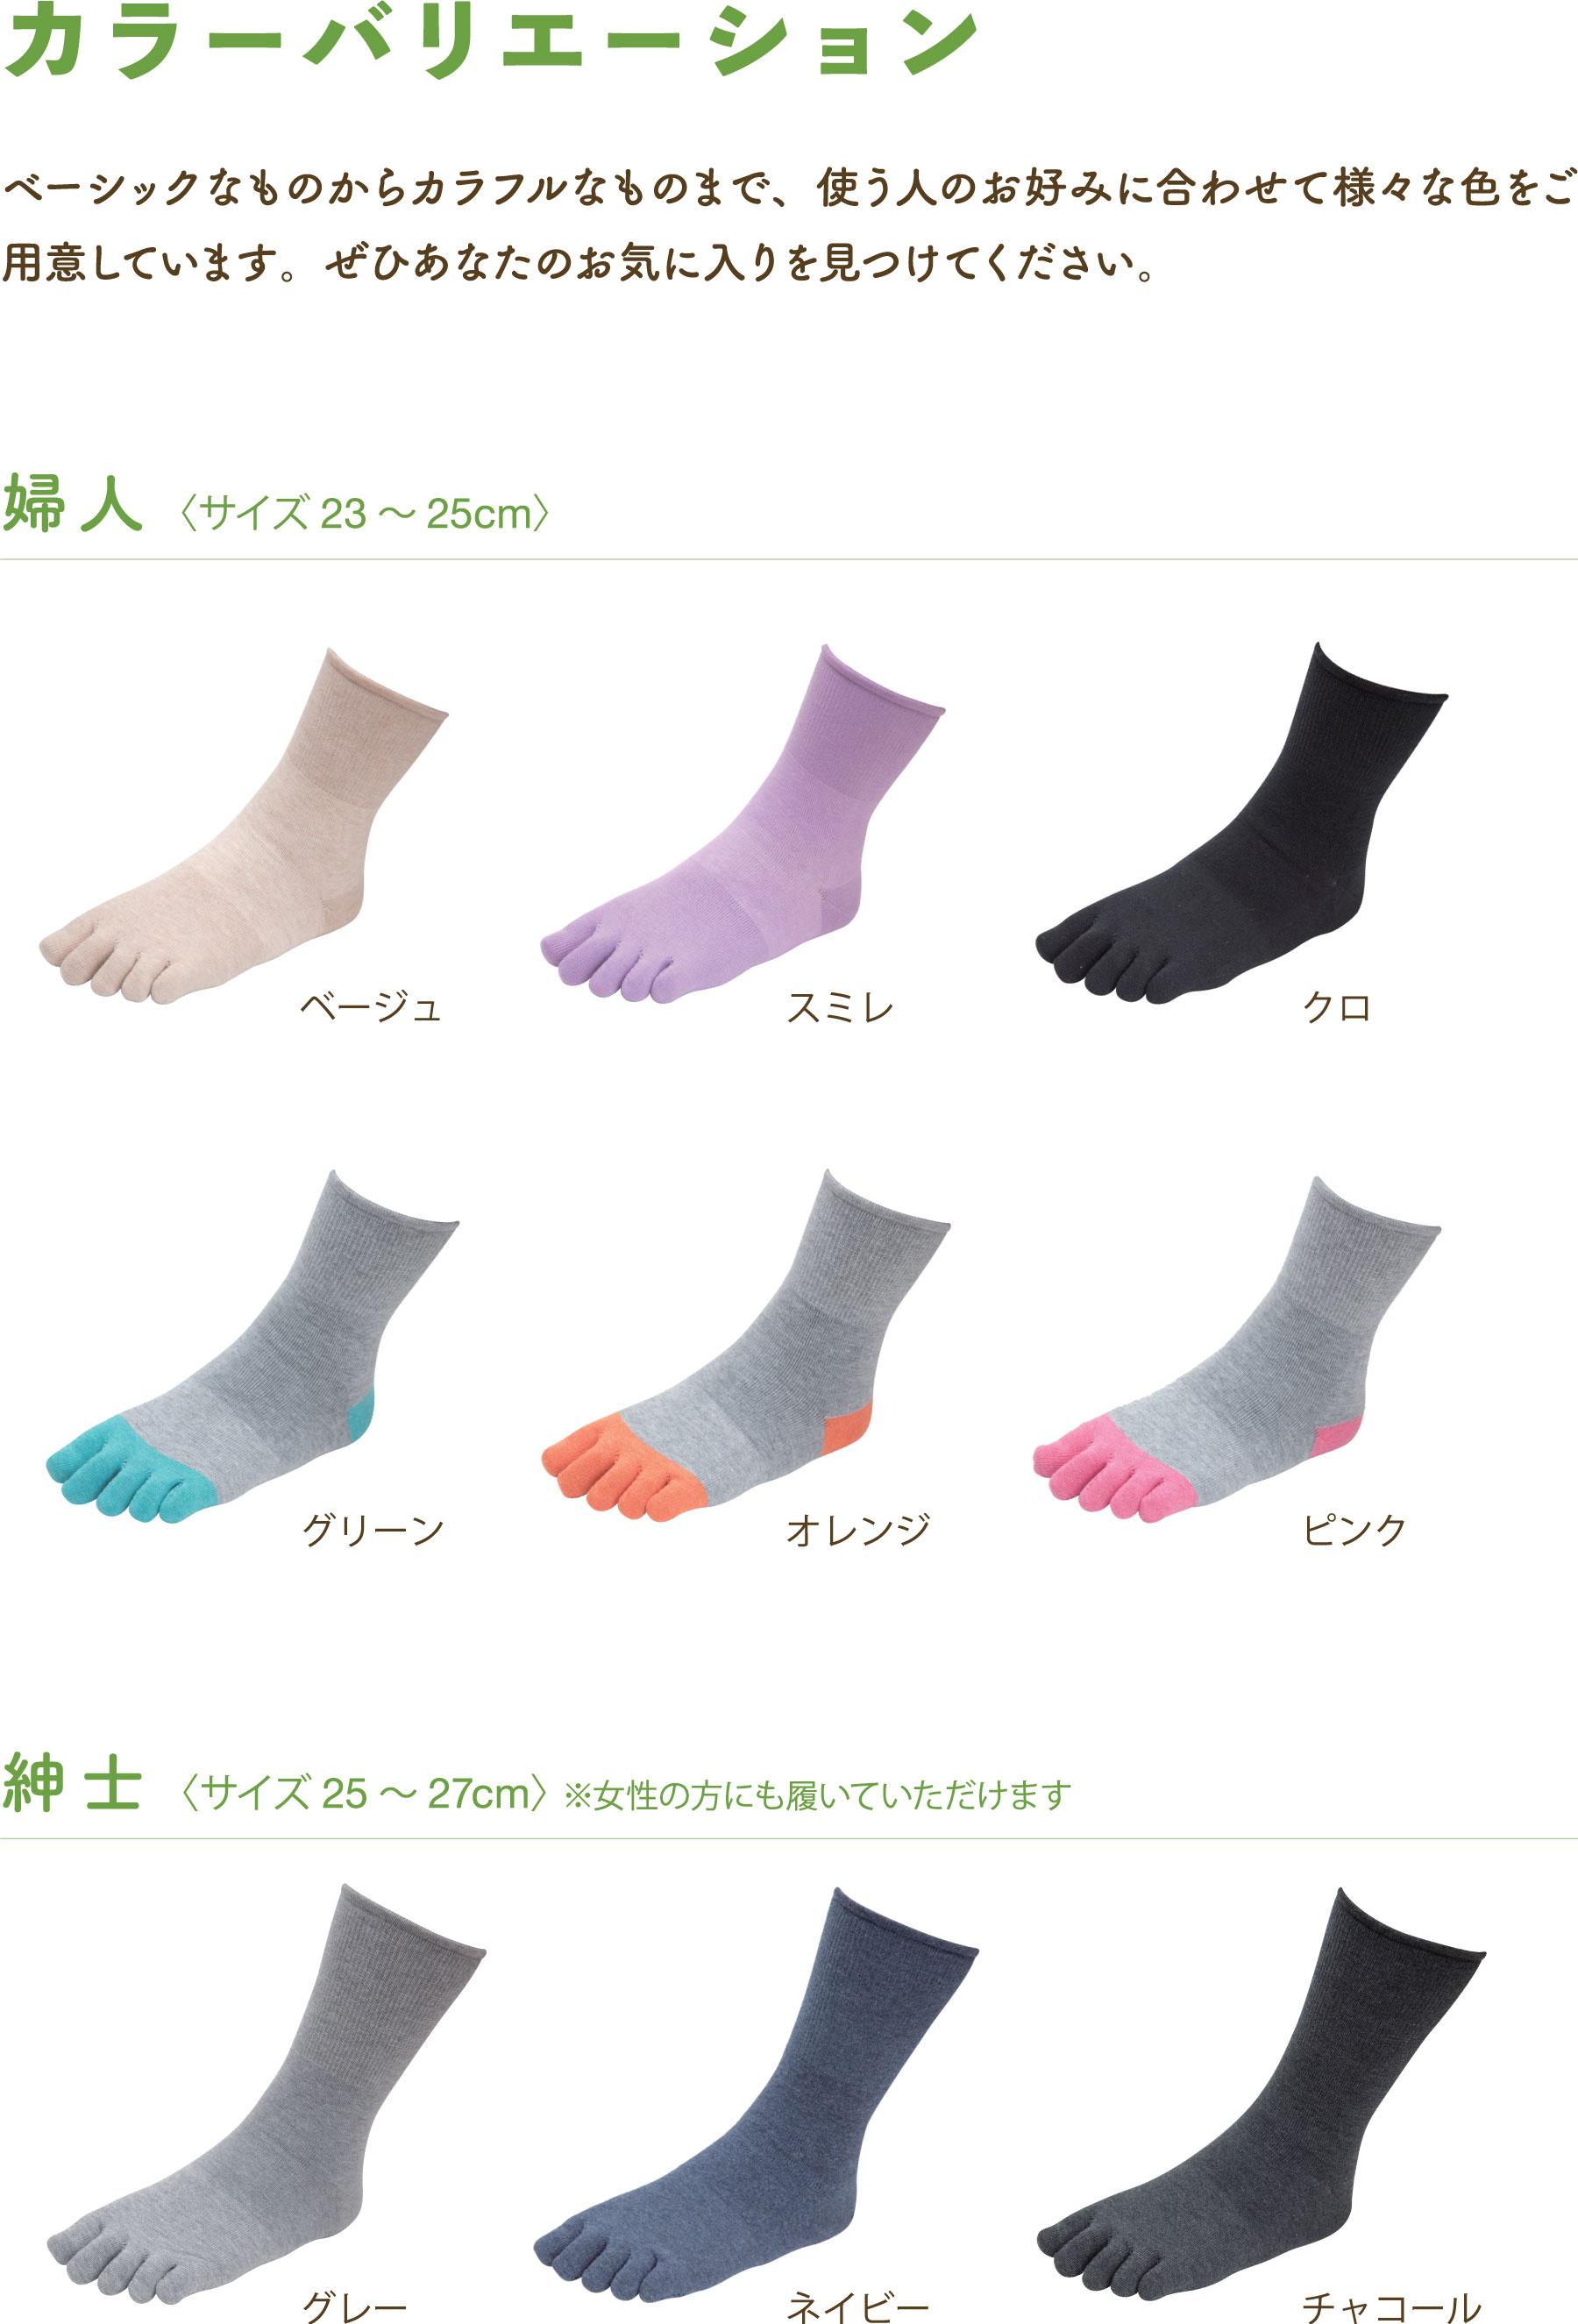 color-image